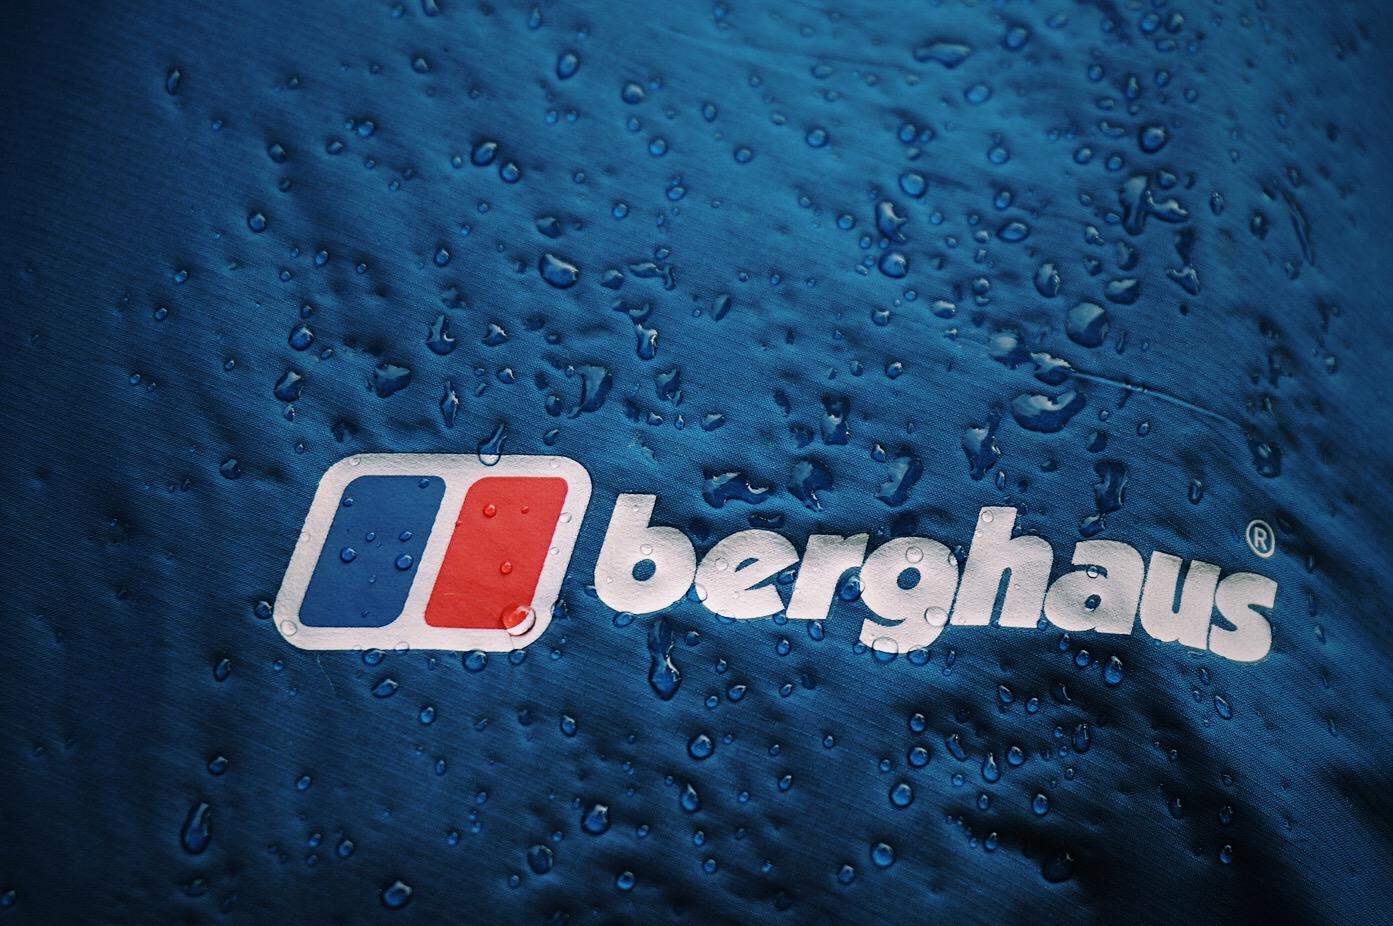 Runssel checked berghaus hyper 100 extrem waterproof jacket - Div onclick href ...